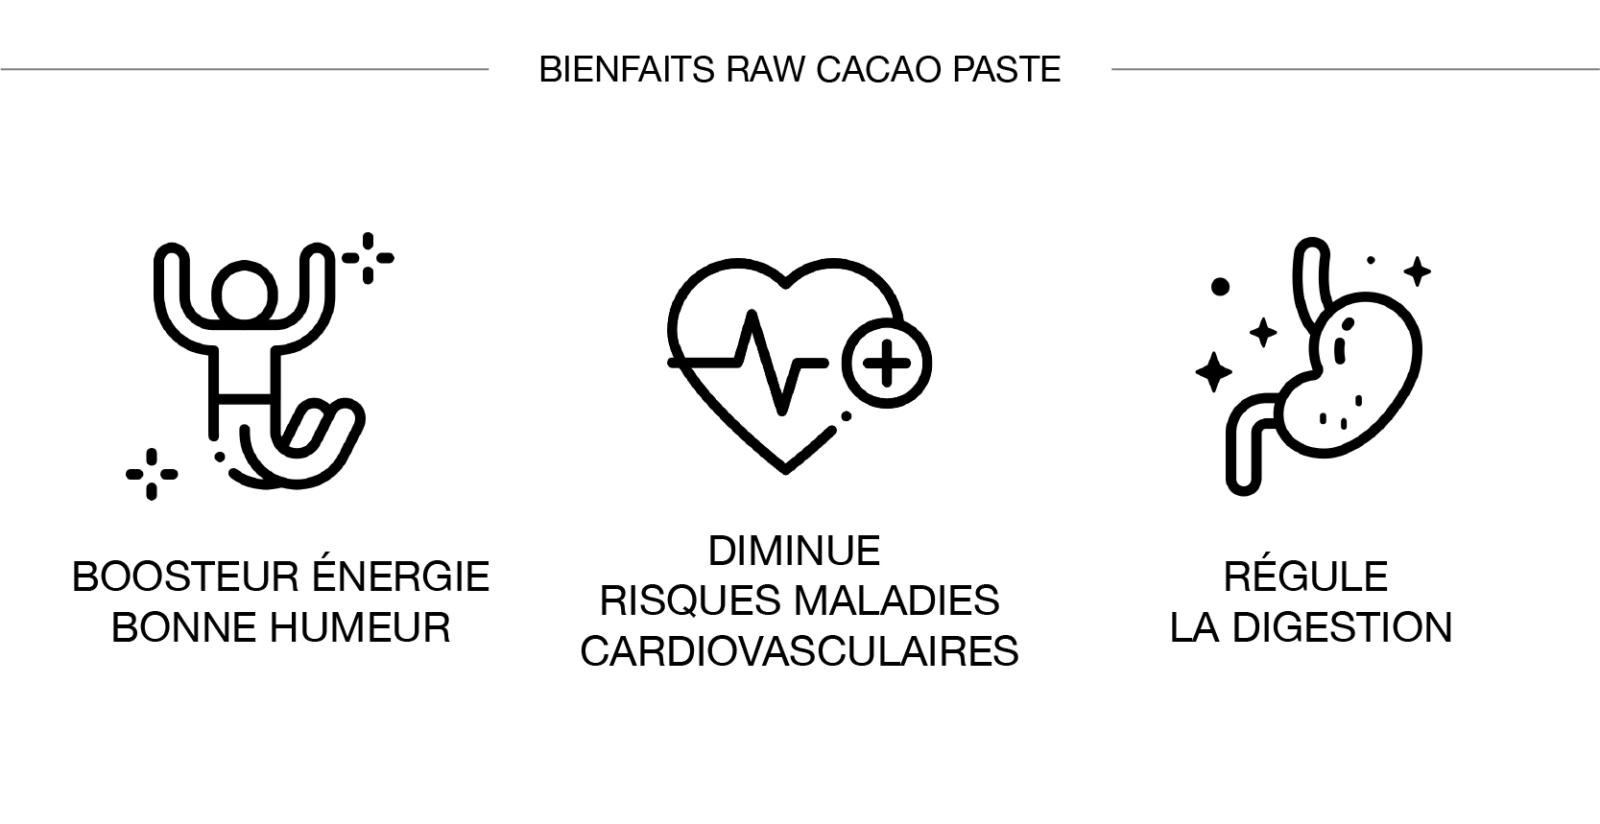 Raw cacao bienfaits